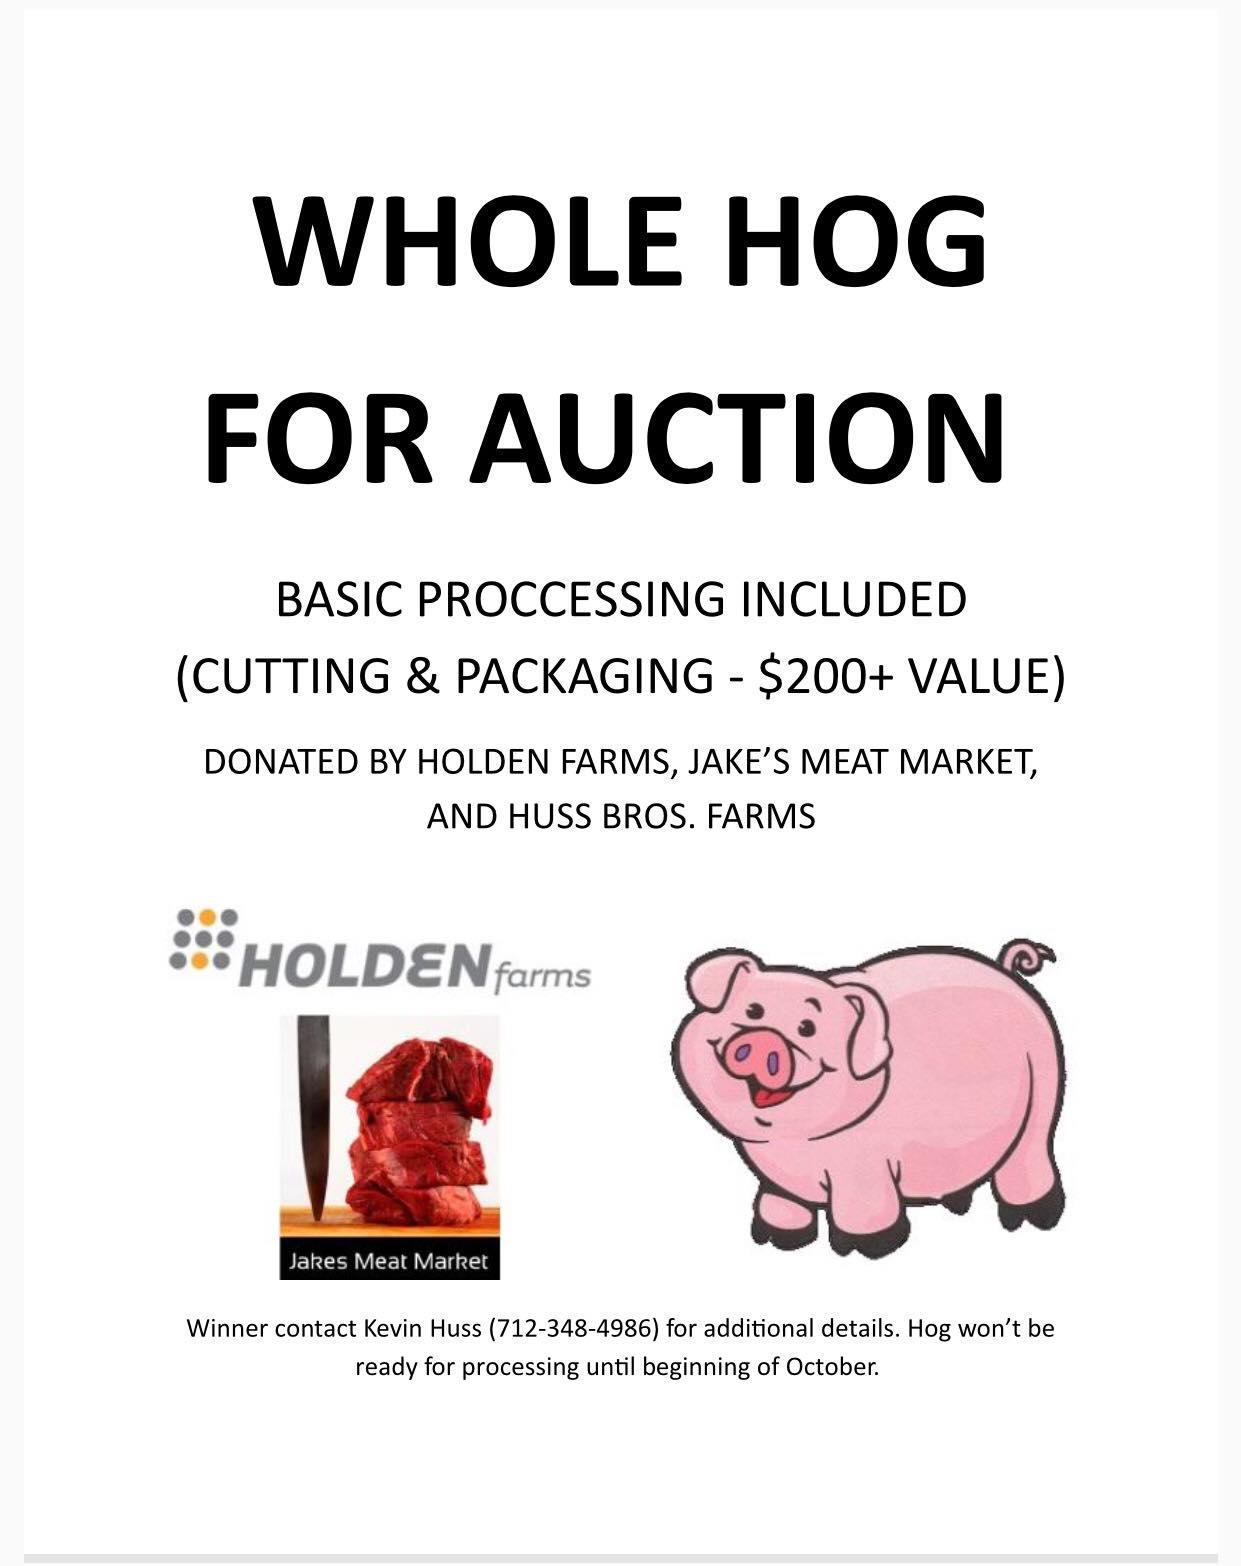 Whole hog & processing